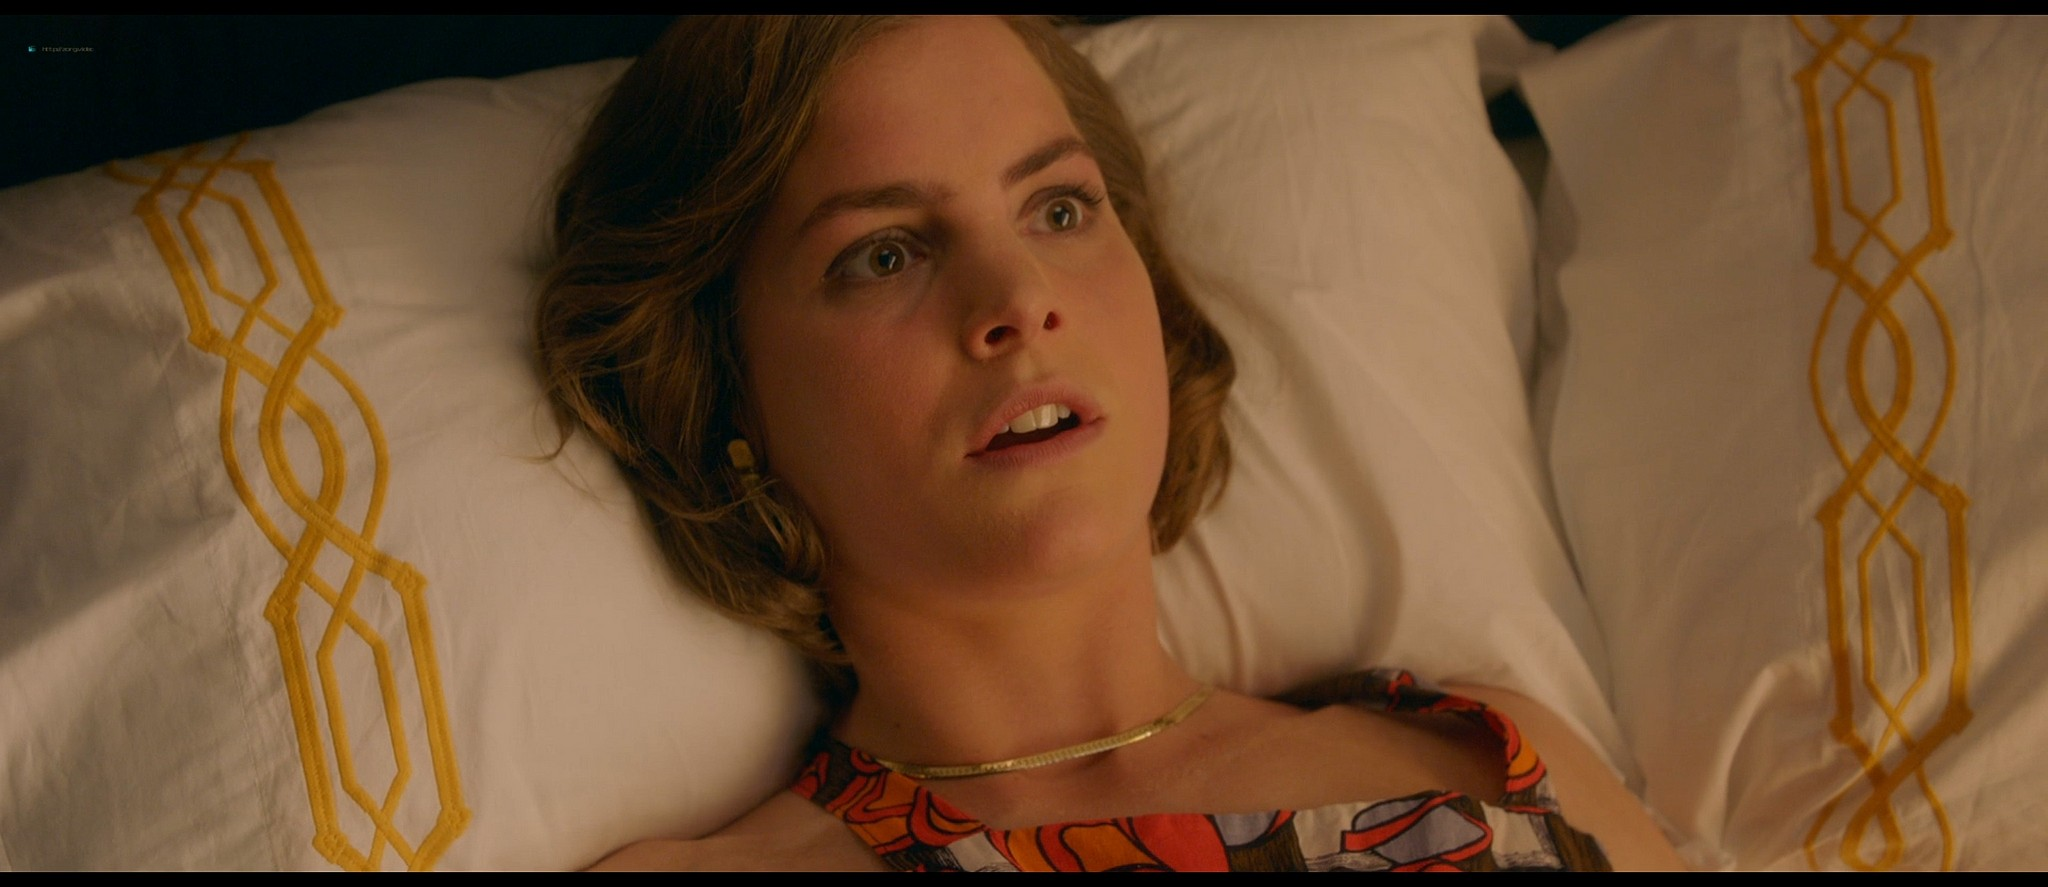 Hannah Hoekstra nude - De Helleveeg (NL -2016) HD 1080p BluRay (5)